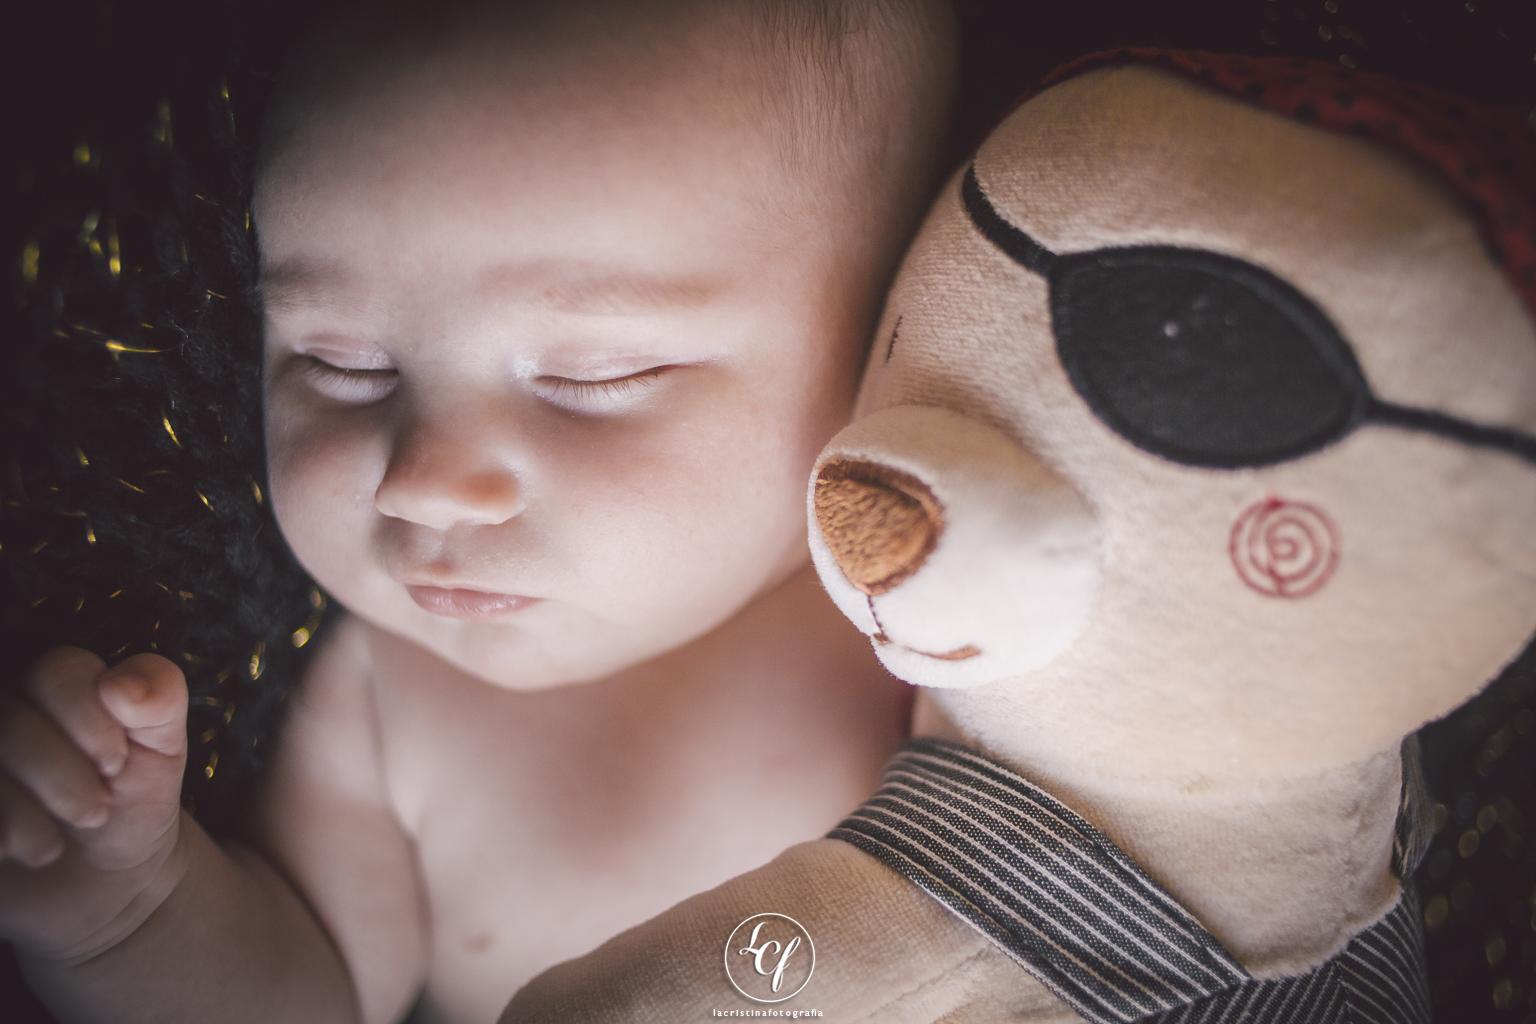 fotógrafo de bebé barcelona :: fotografía de bebé natural :: fotografía de recién nacido :: fotografía de famiilia